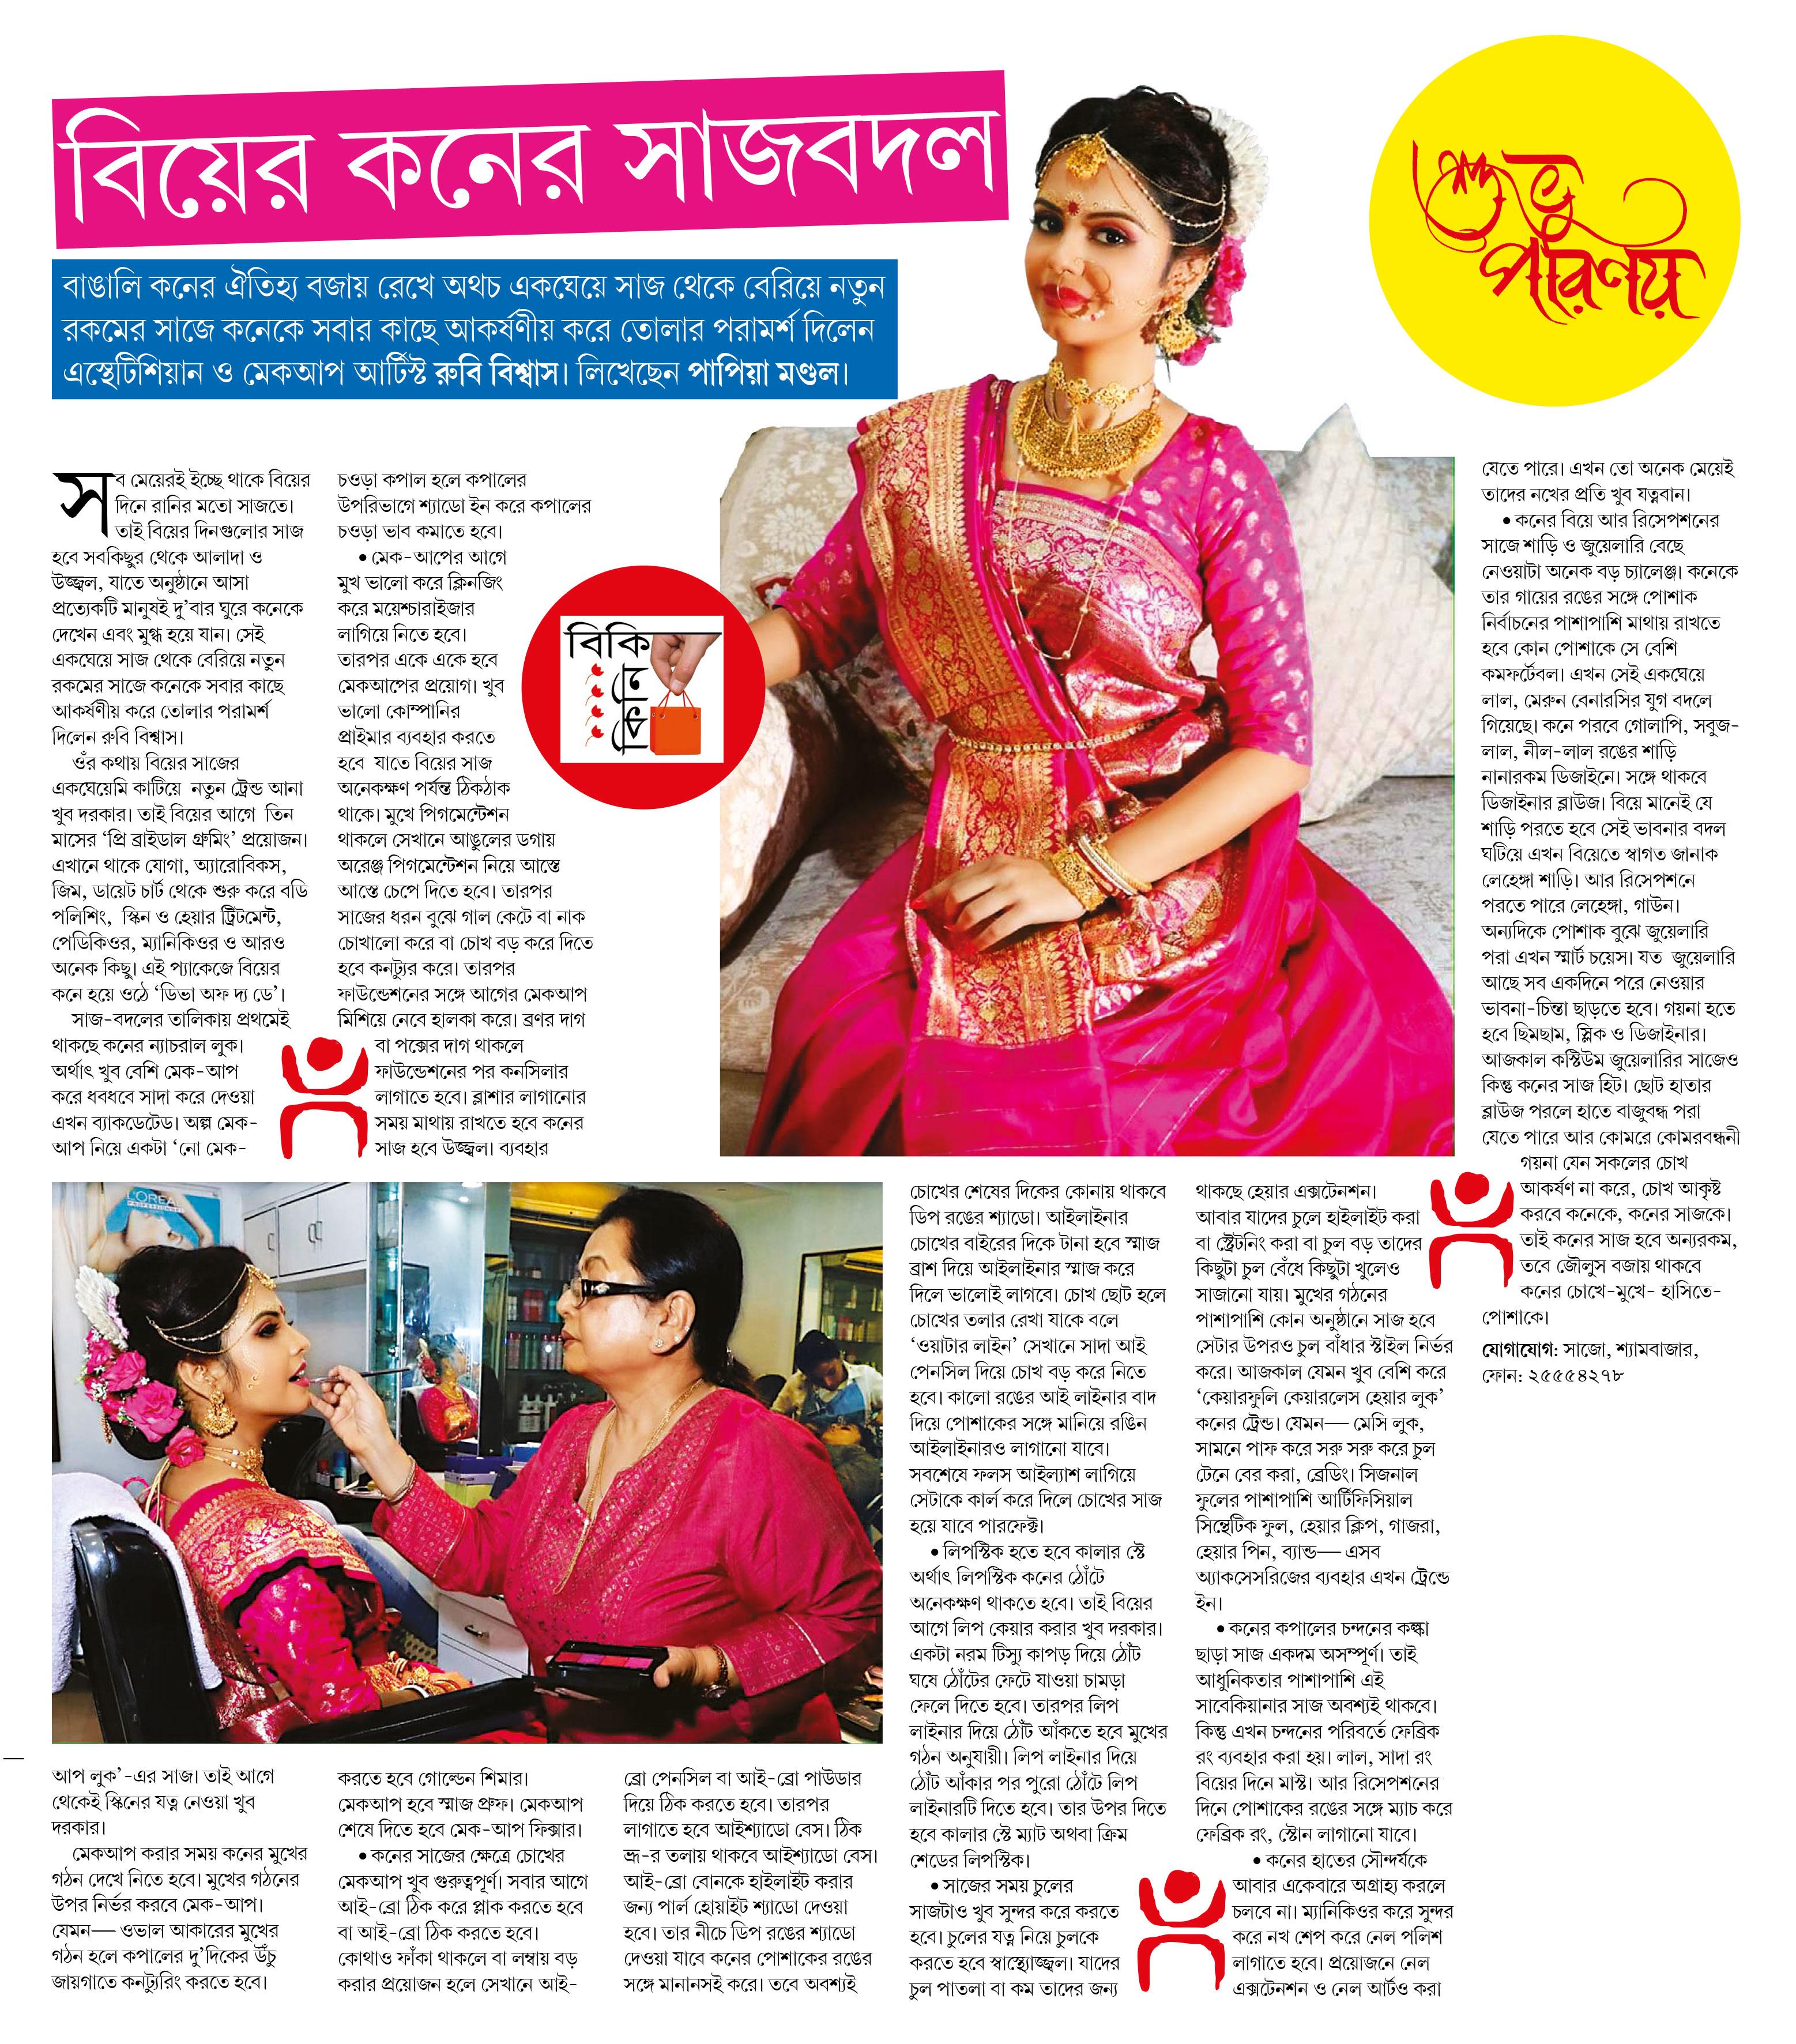 Beauty clinic in North Kolkata